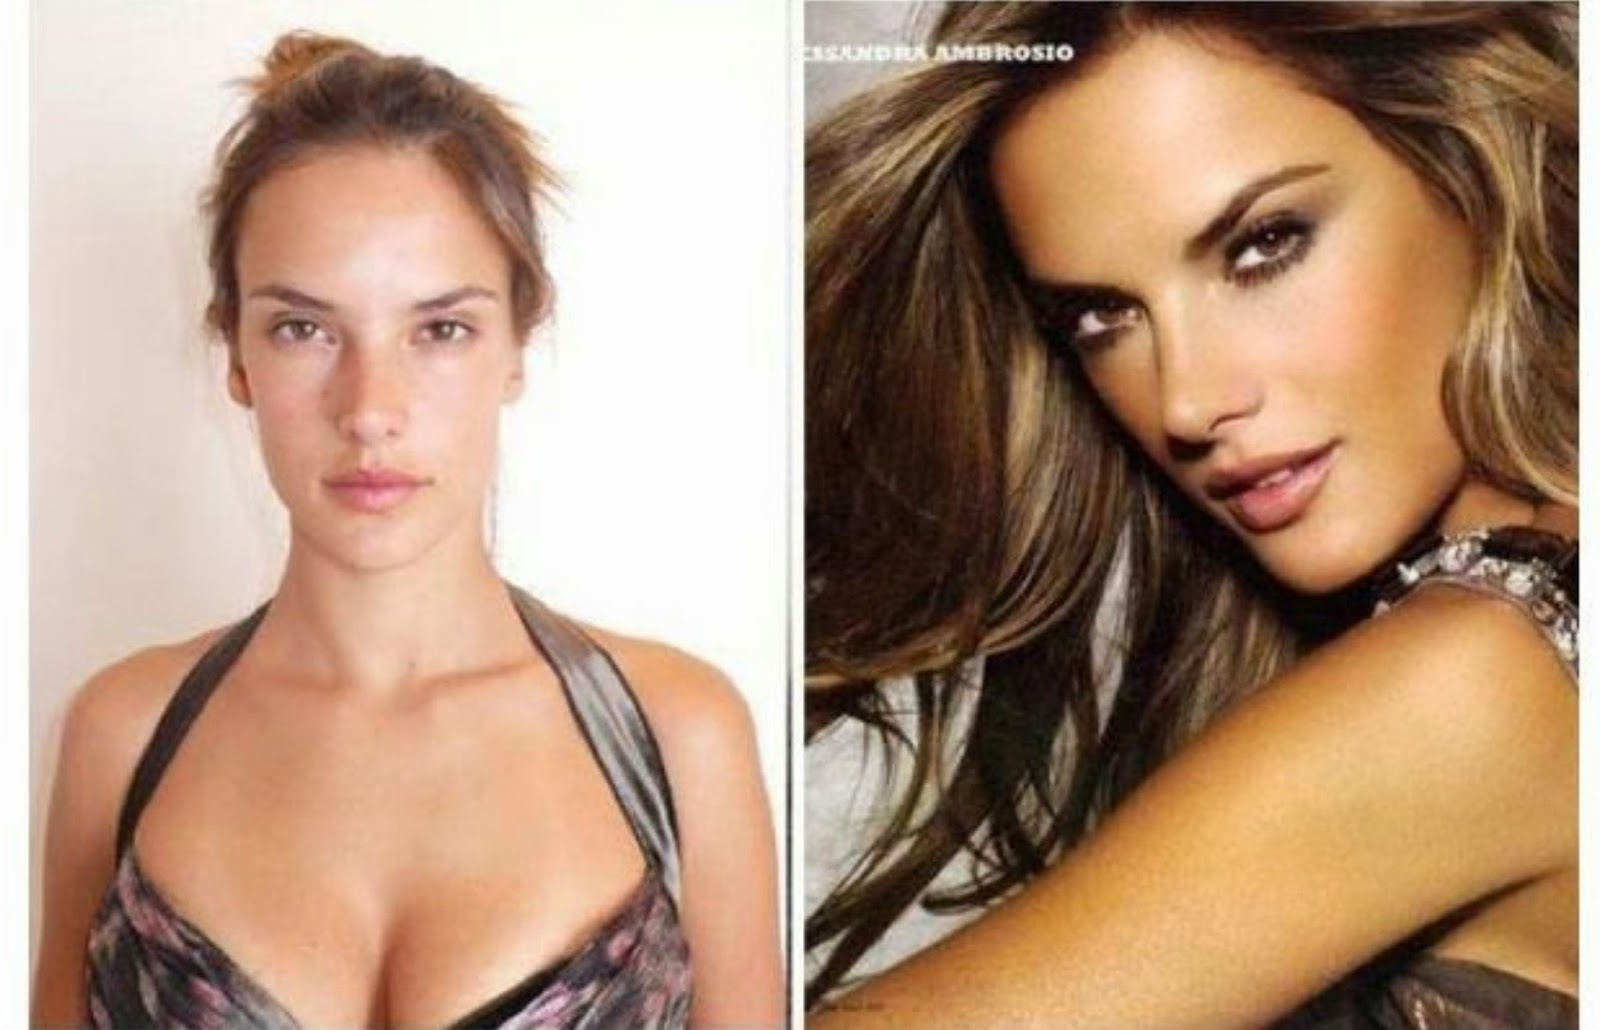 Фото с макияжем и без моделей виктории сикрет